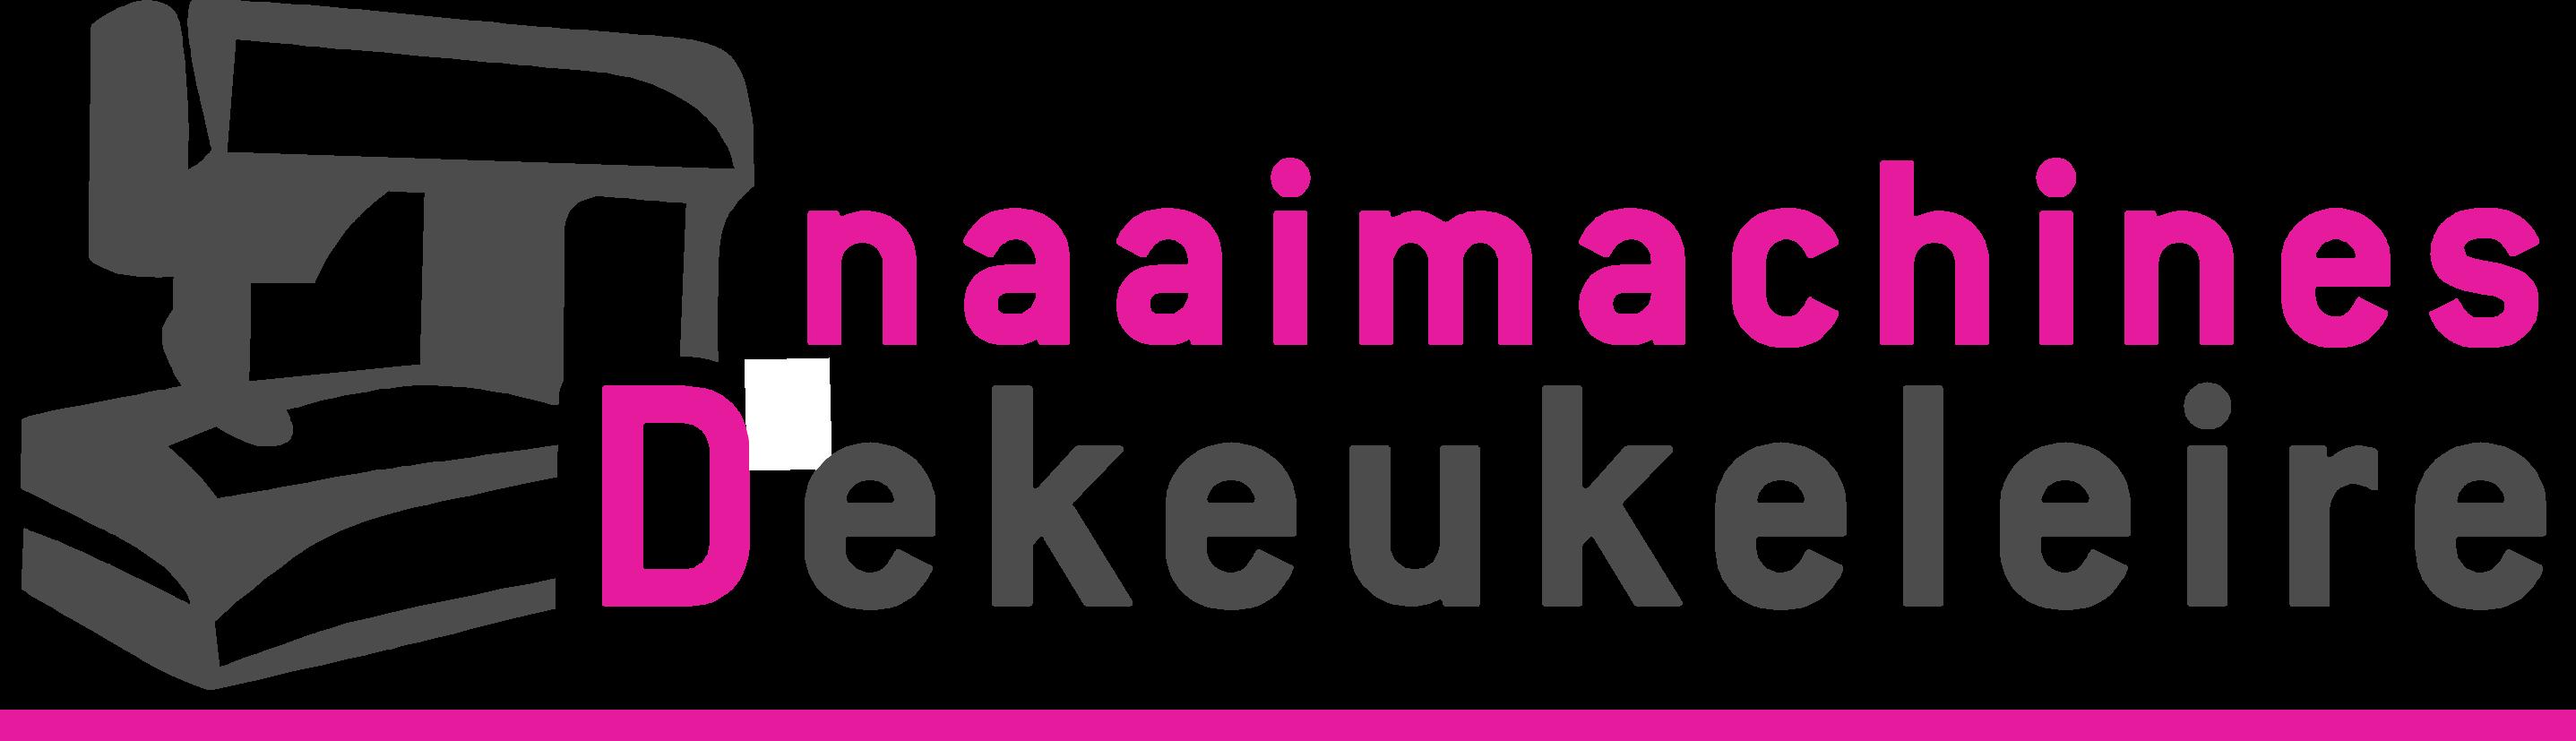 De Keukeleire Naaimachines